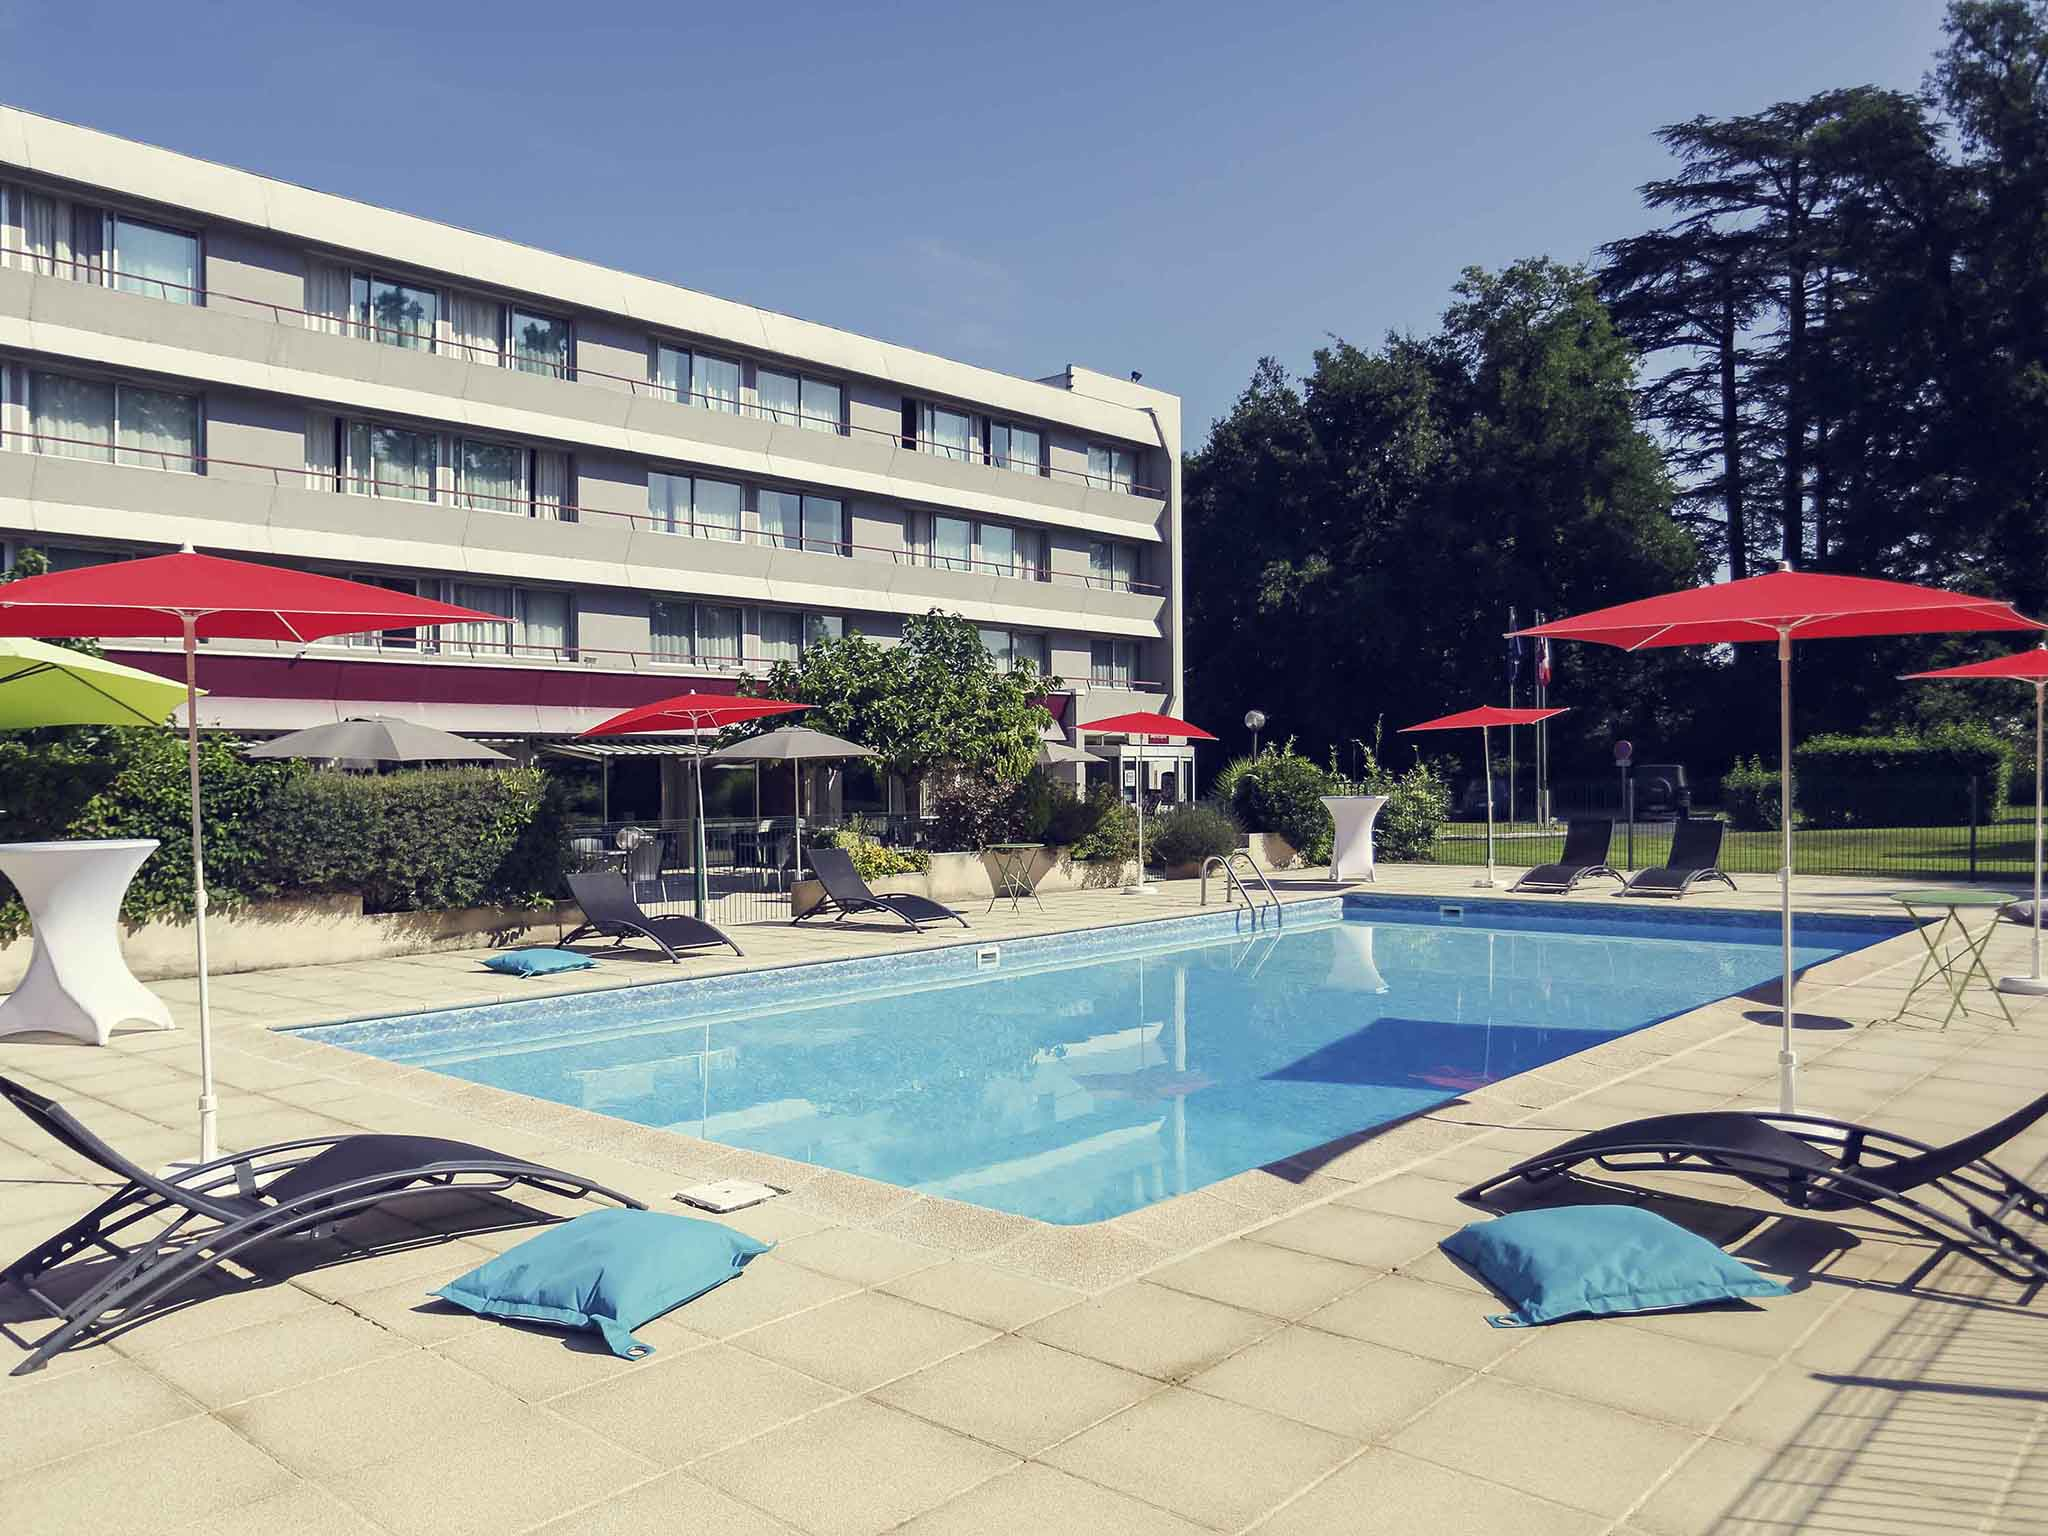 Hotel – Albergo Mercure Brive